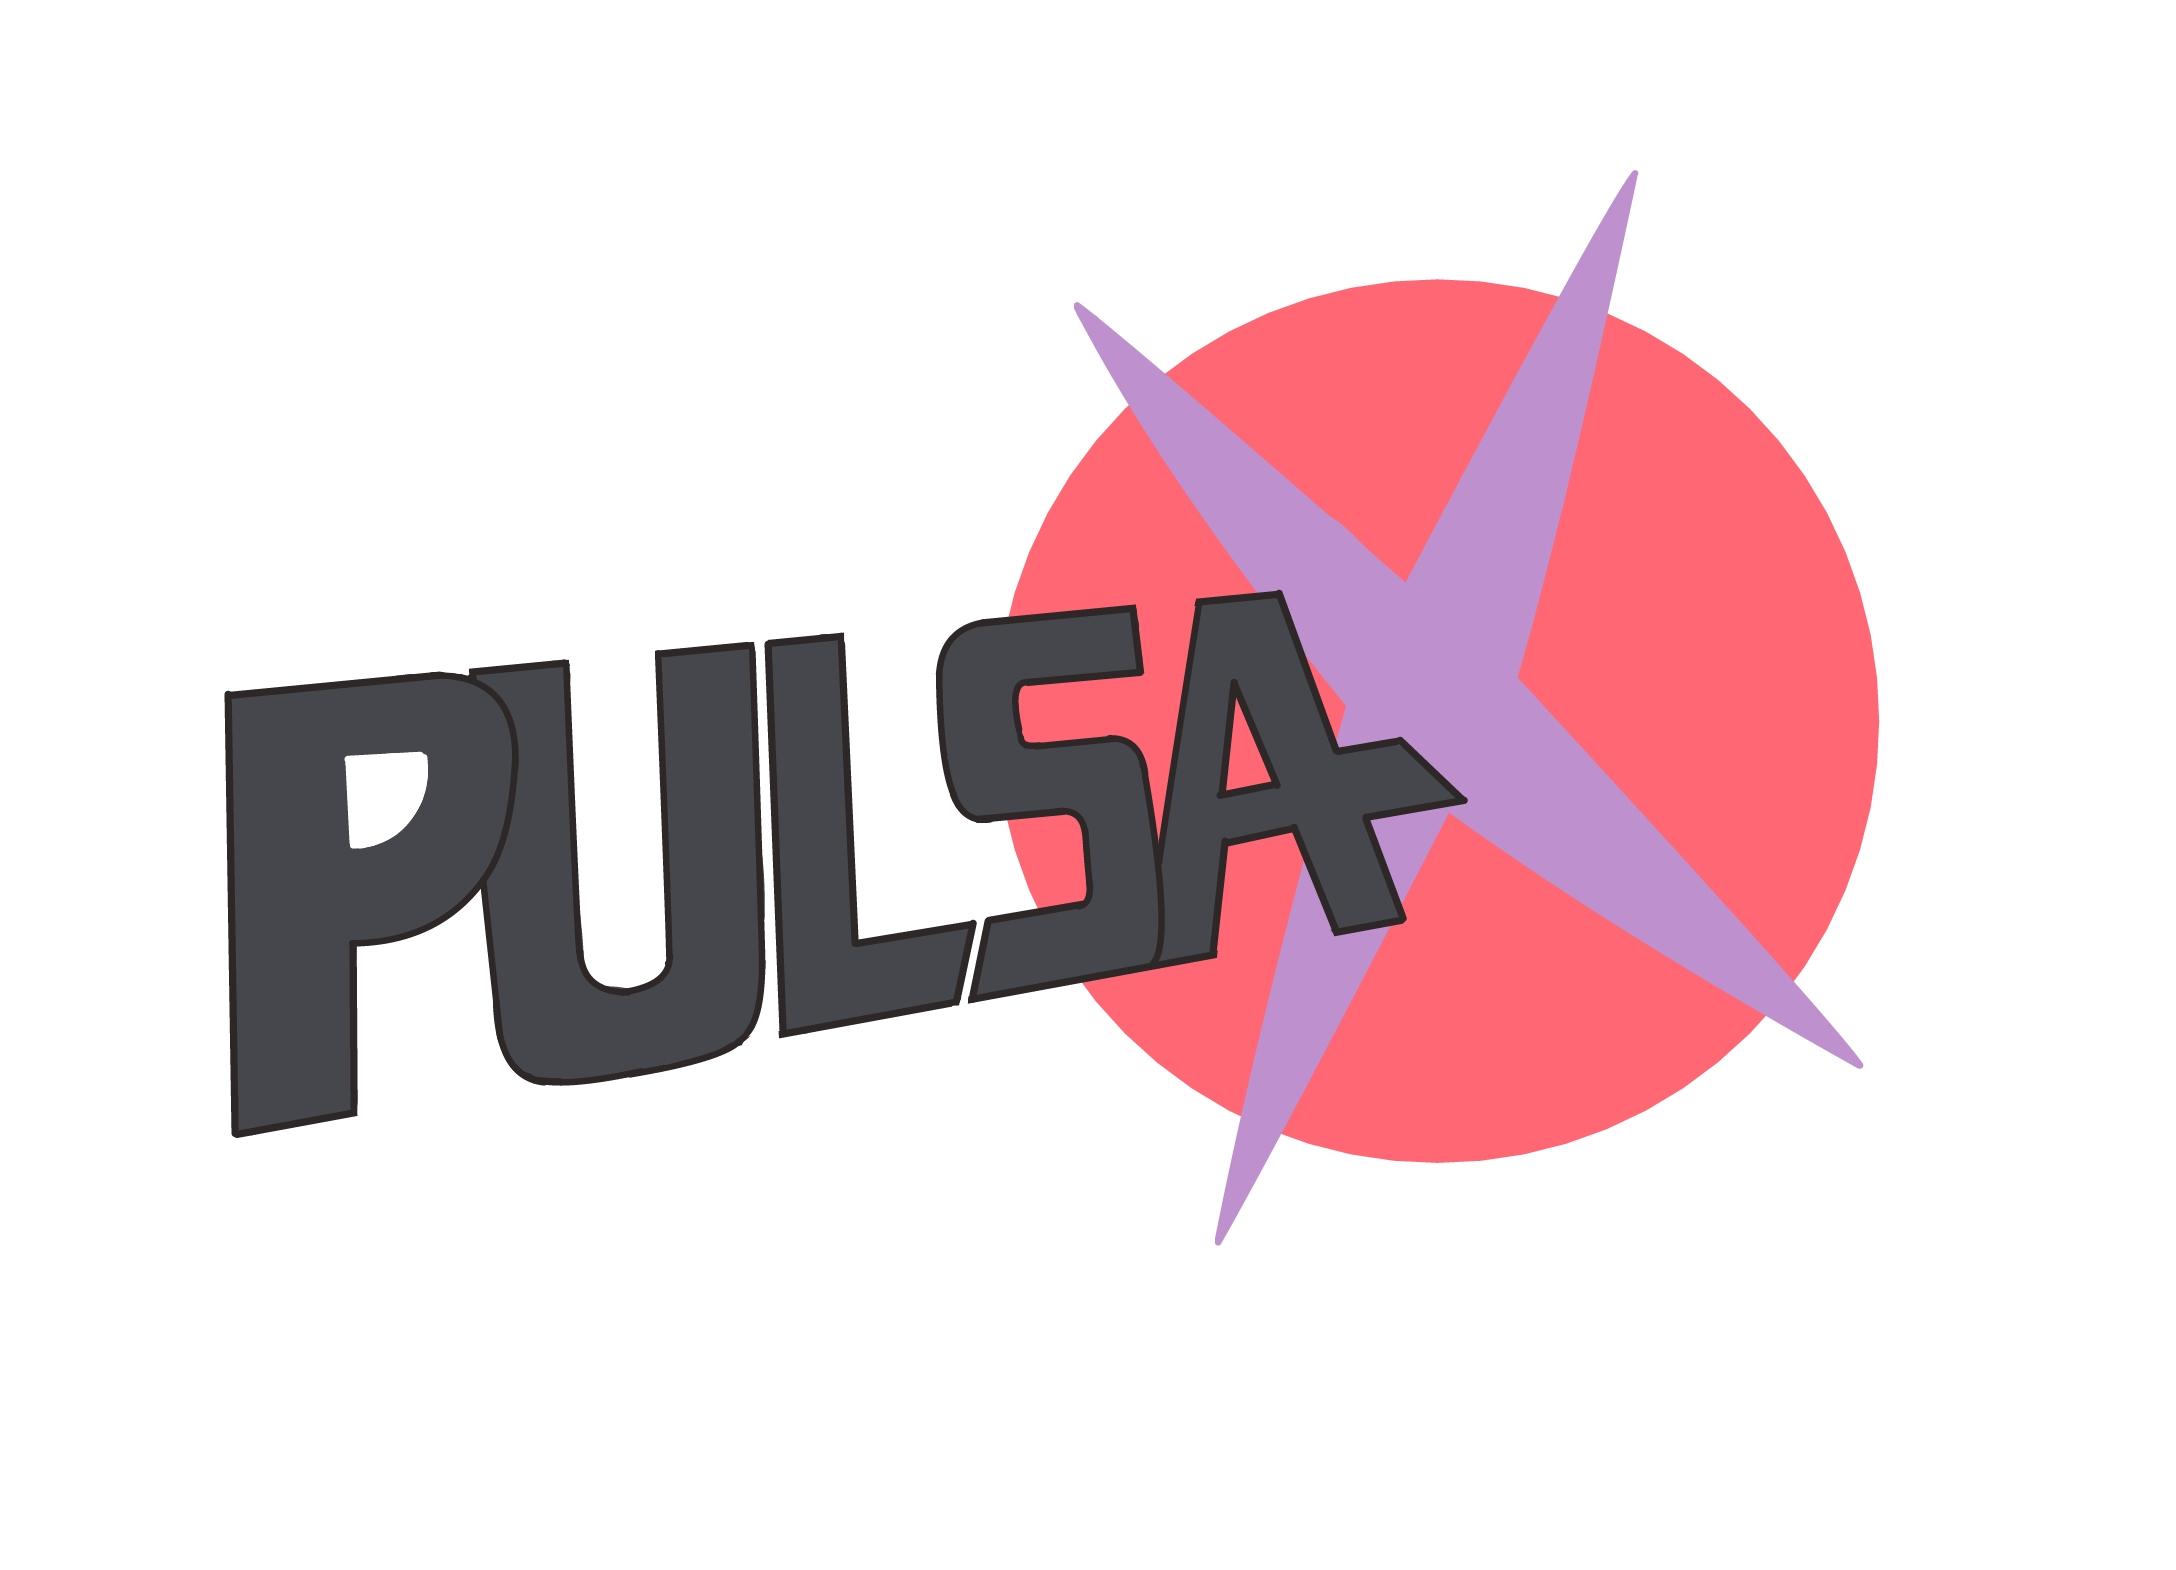 PULSAX-PROGRAMA8